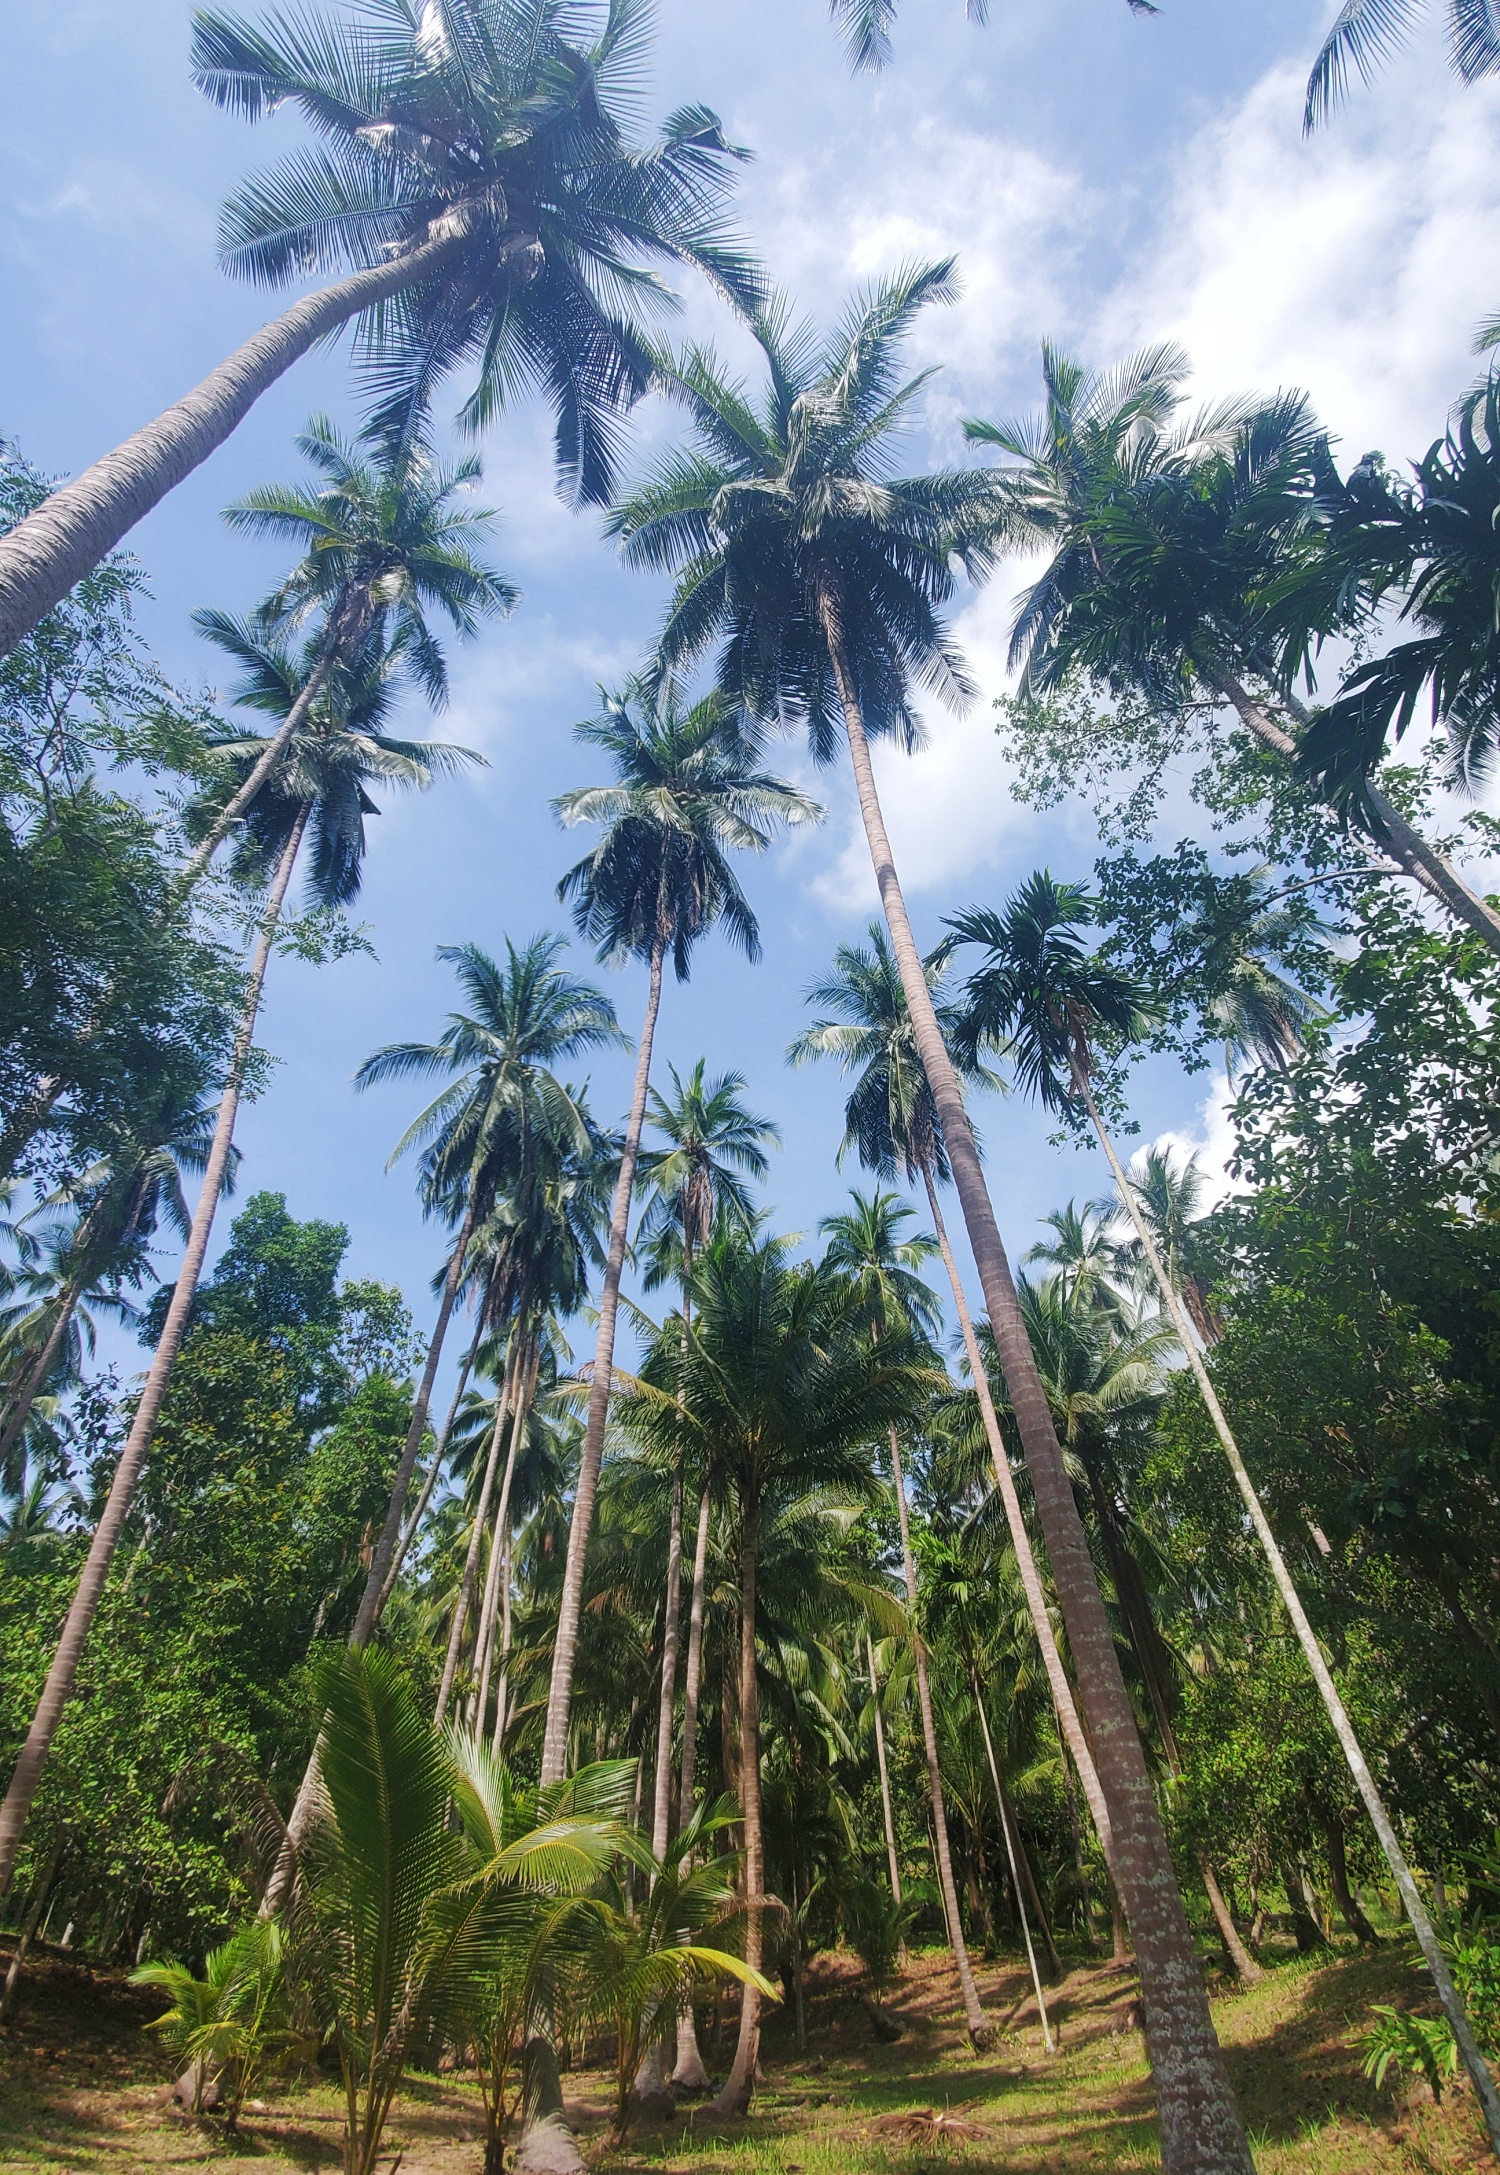 Koh Samui palm trees